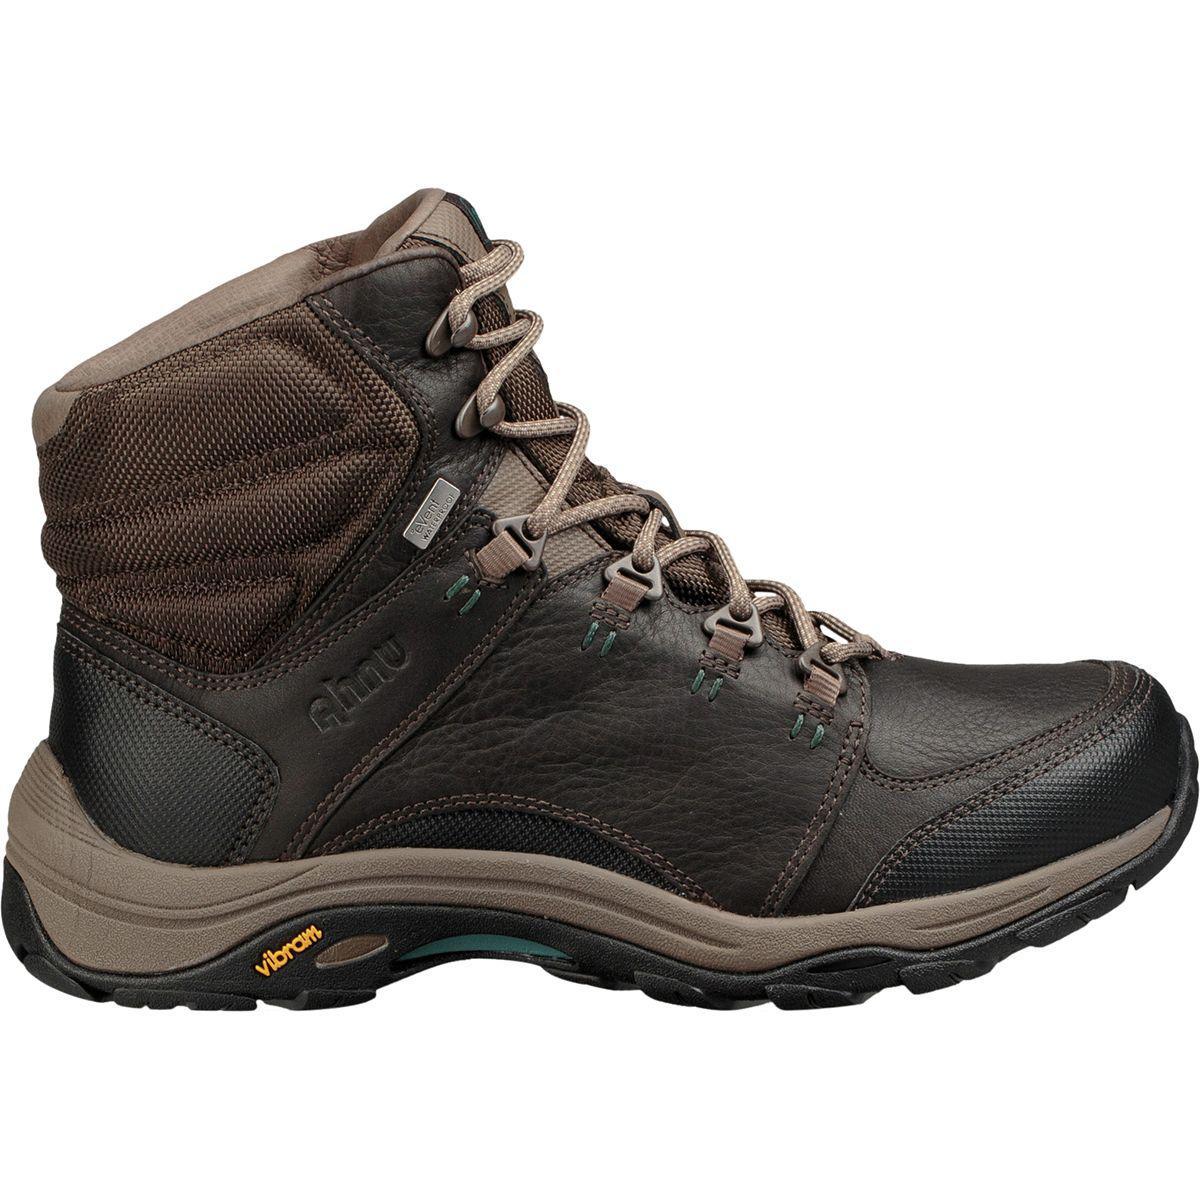 Montara Iii Fg Event Hiking Boot